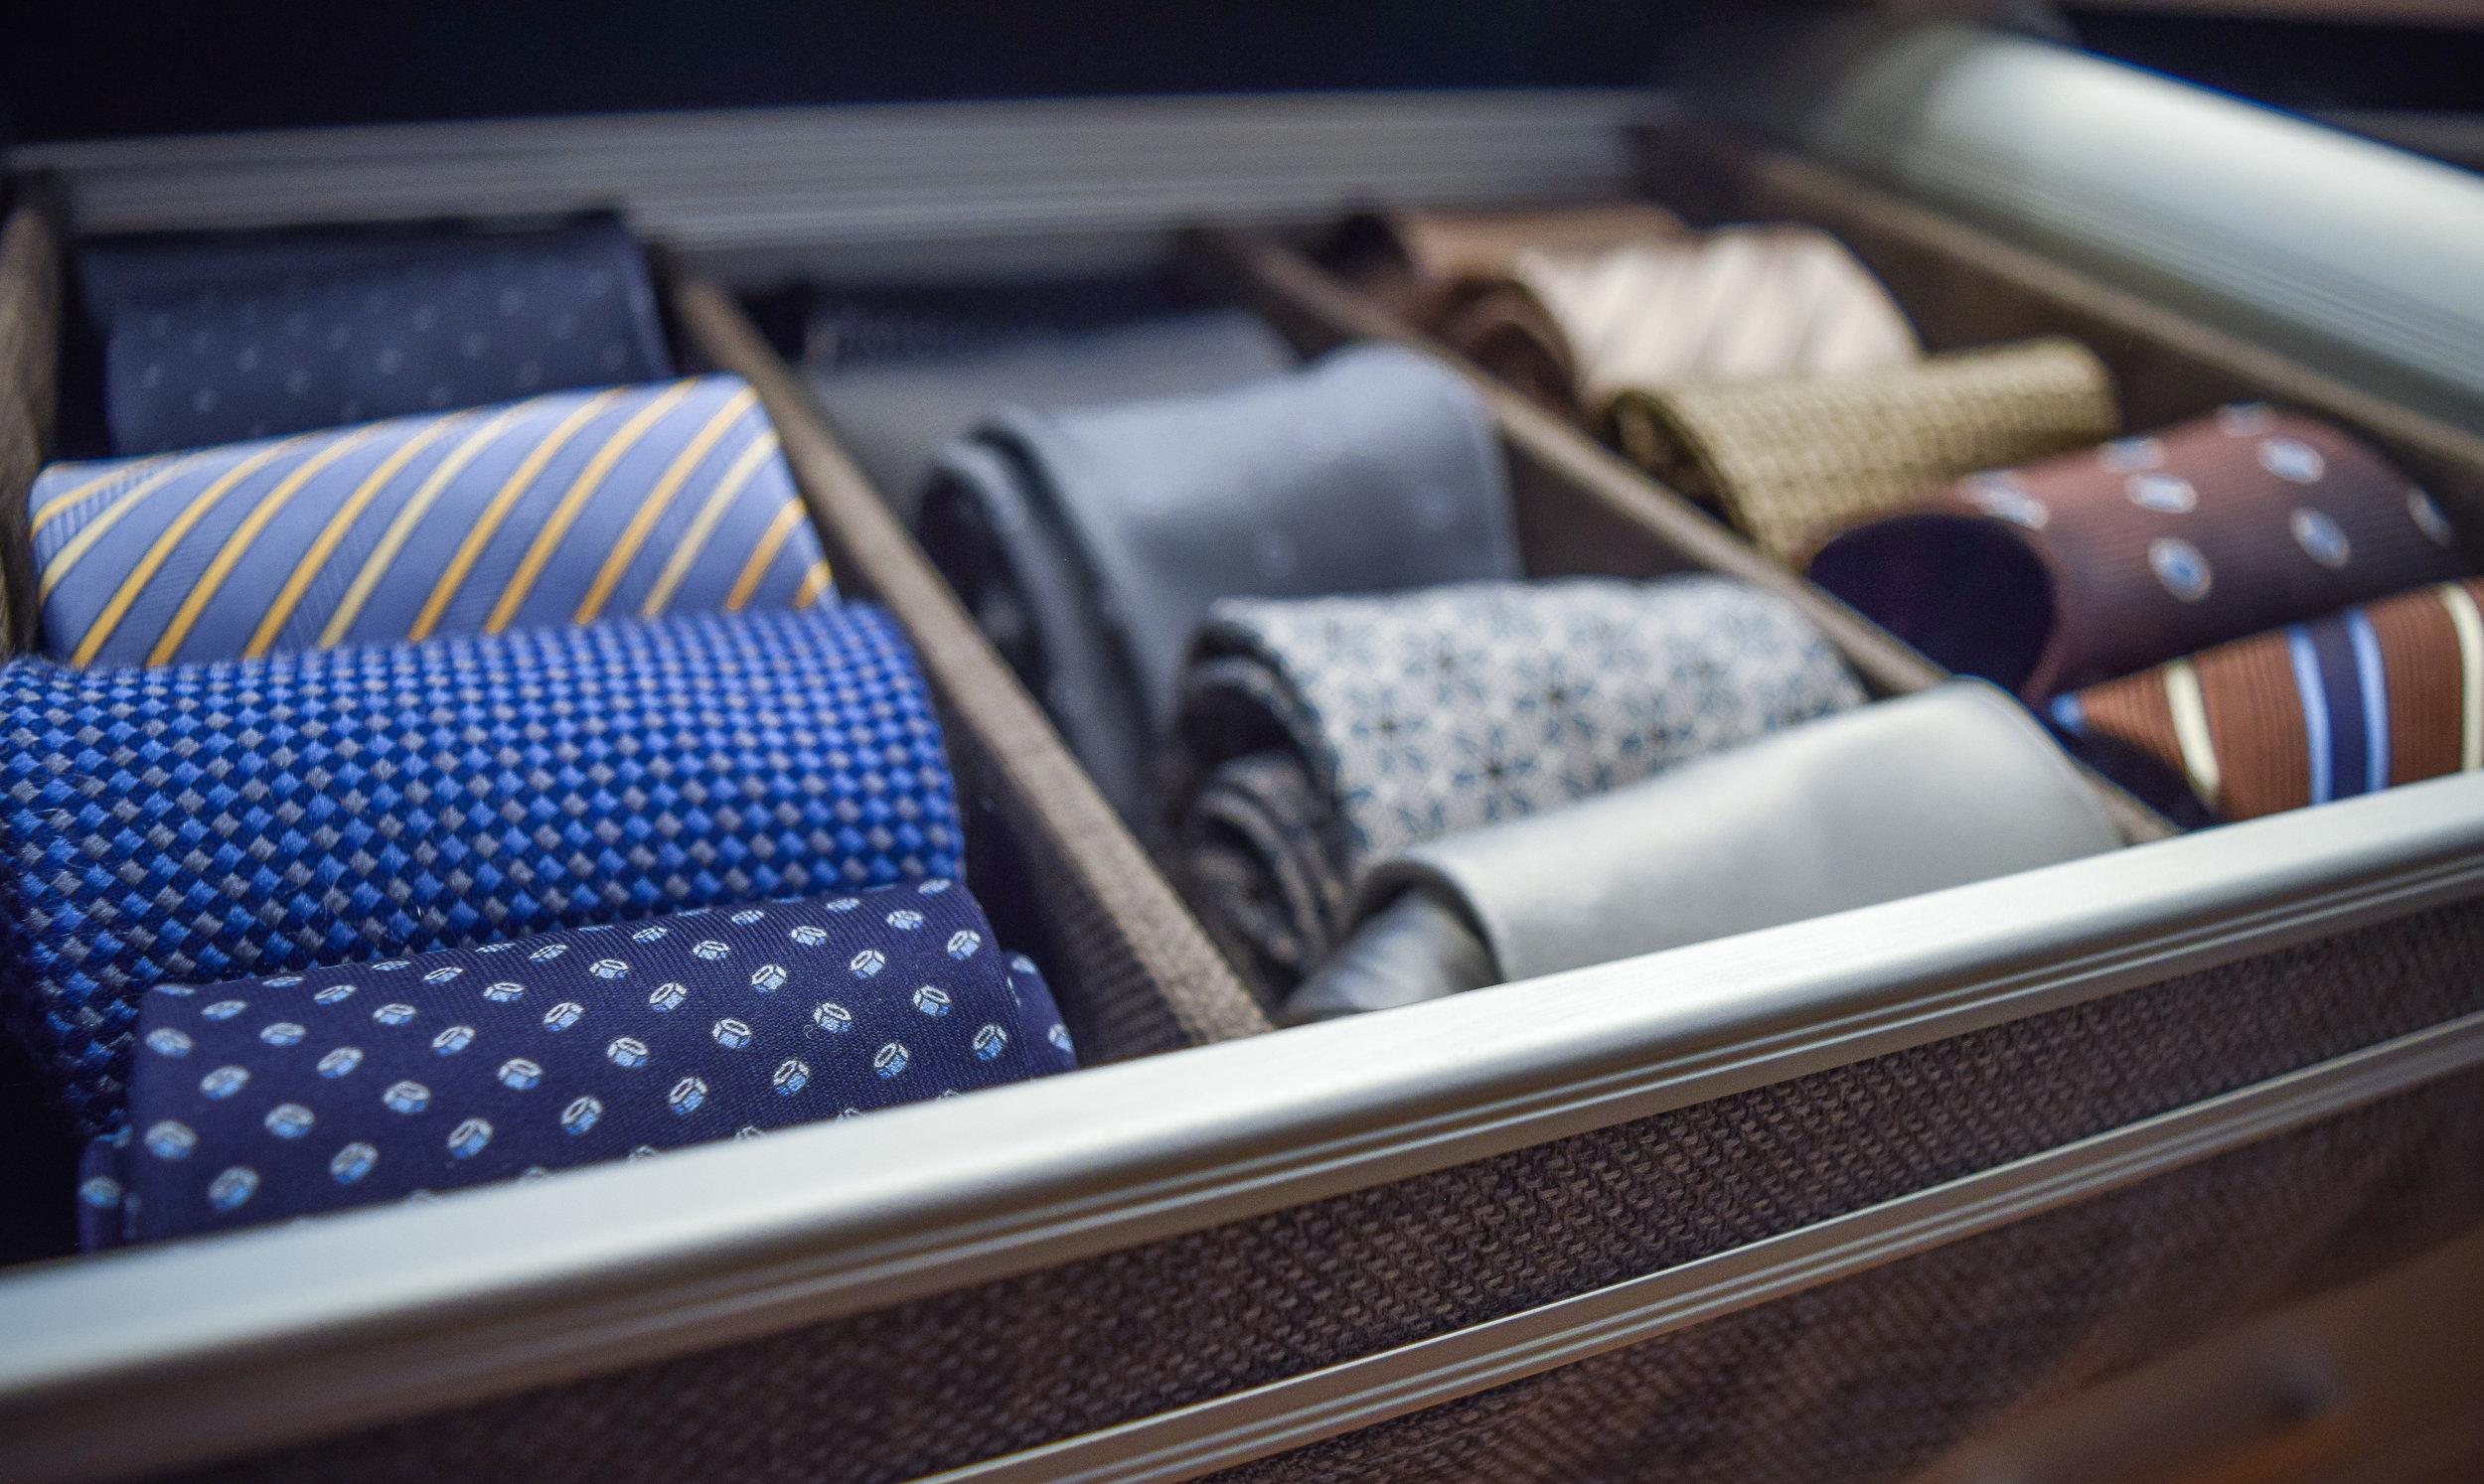 Master closet tie close up angle.jpg